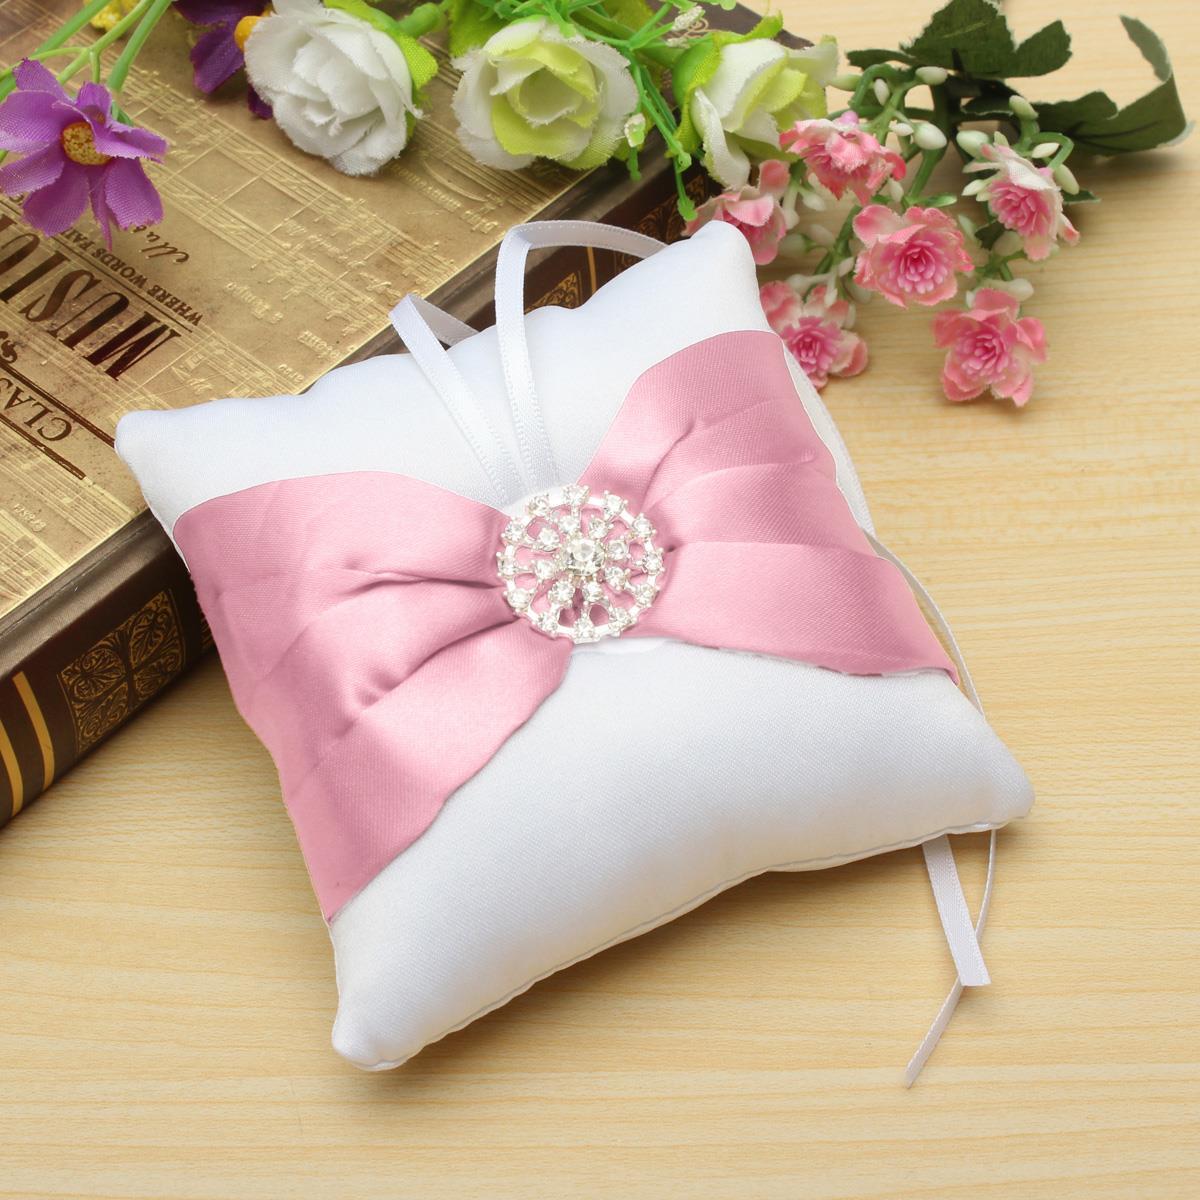 9cm*9cm Bowknot Diamante Display Cushion Romantic Wedding Ring Gift Cube Pillow Storage Beautiful White Satin(China (Mainland))